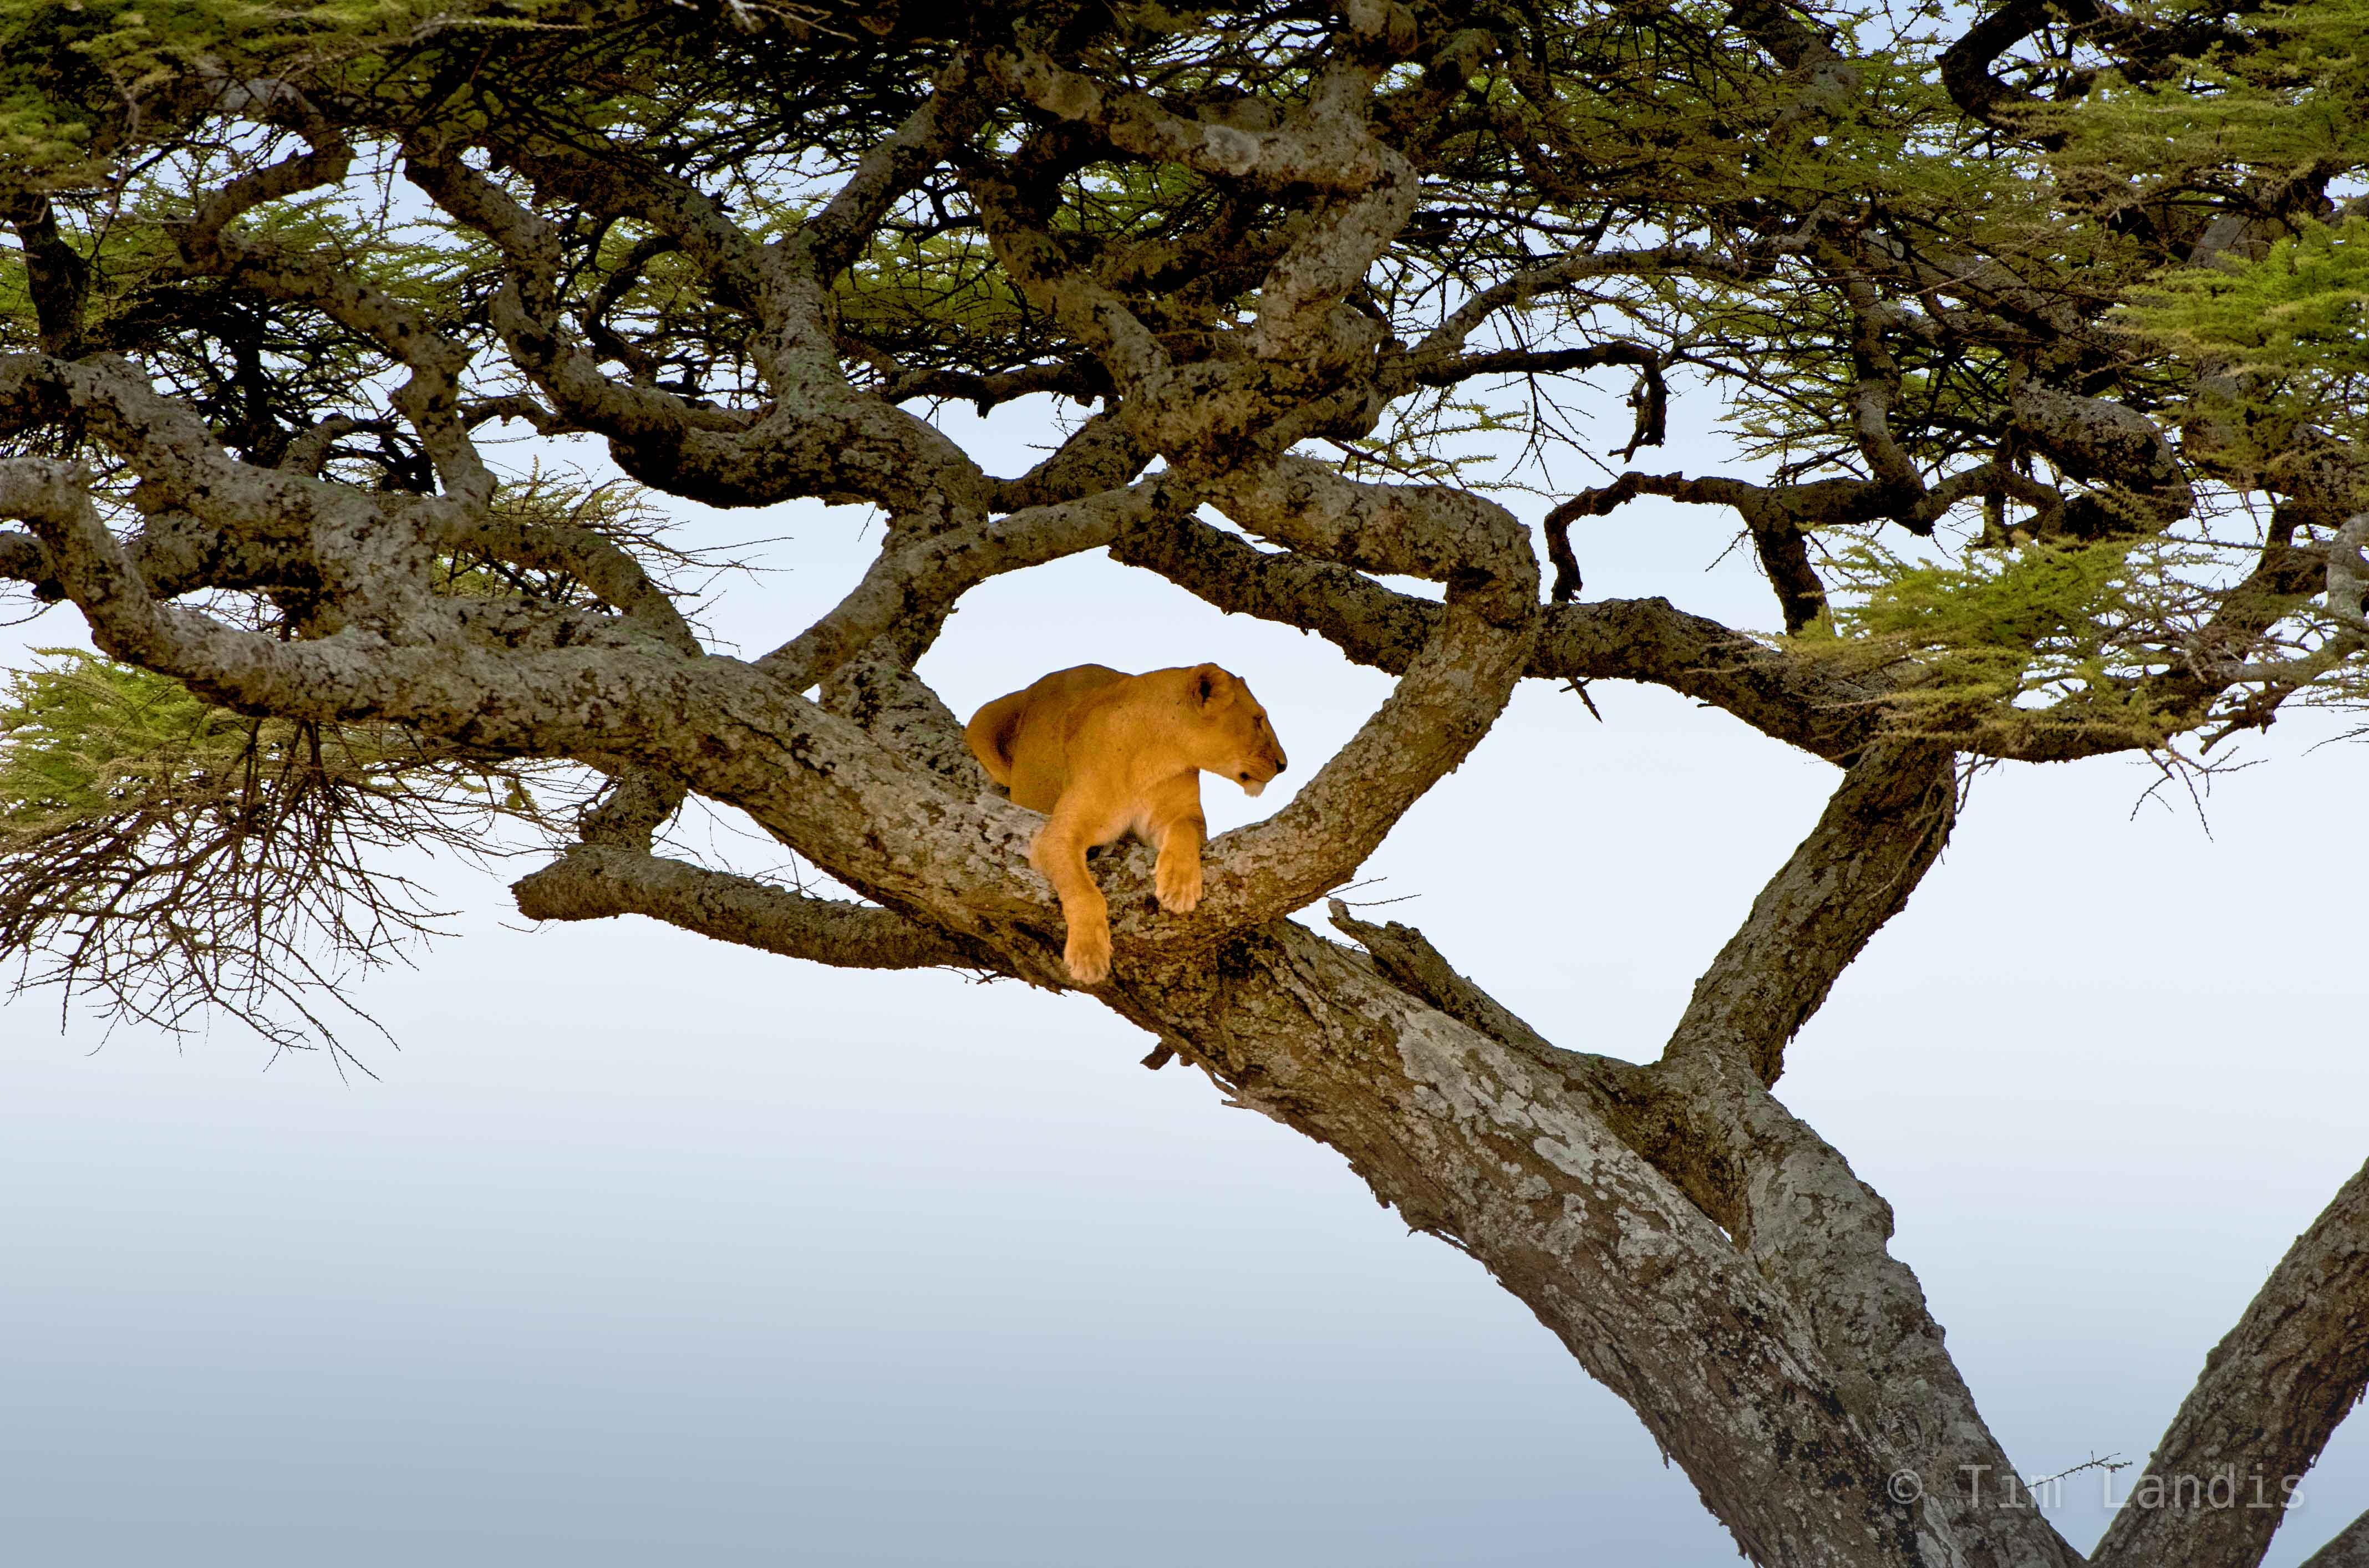 tree climbing lions of Tanzania, photo